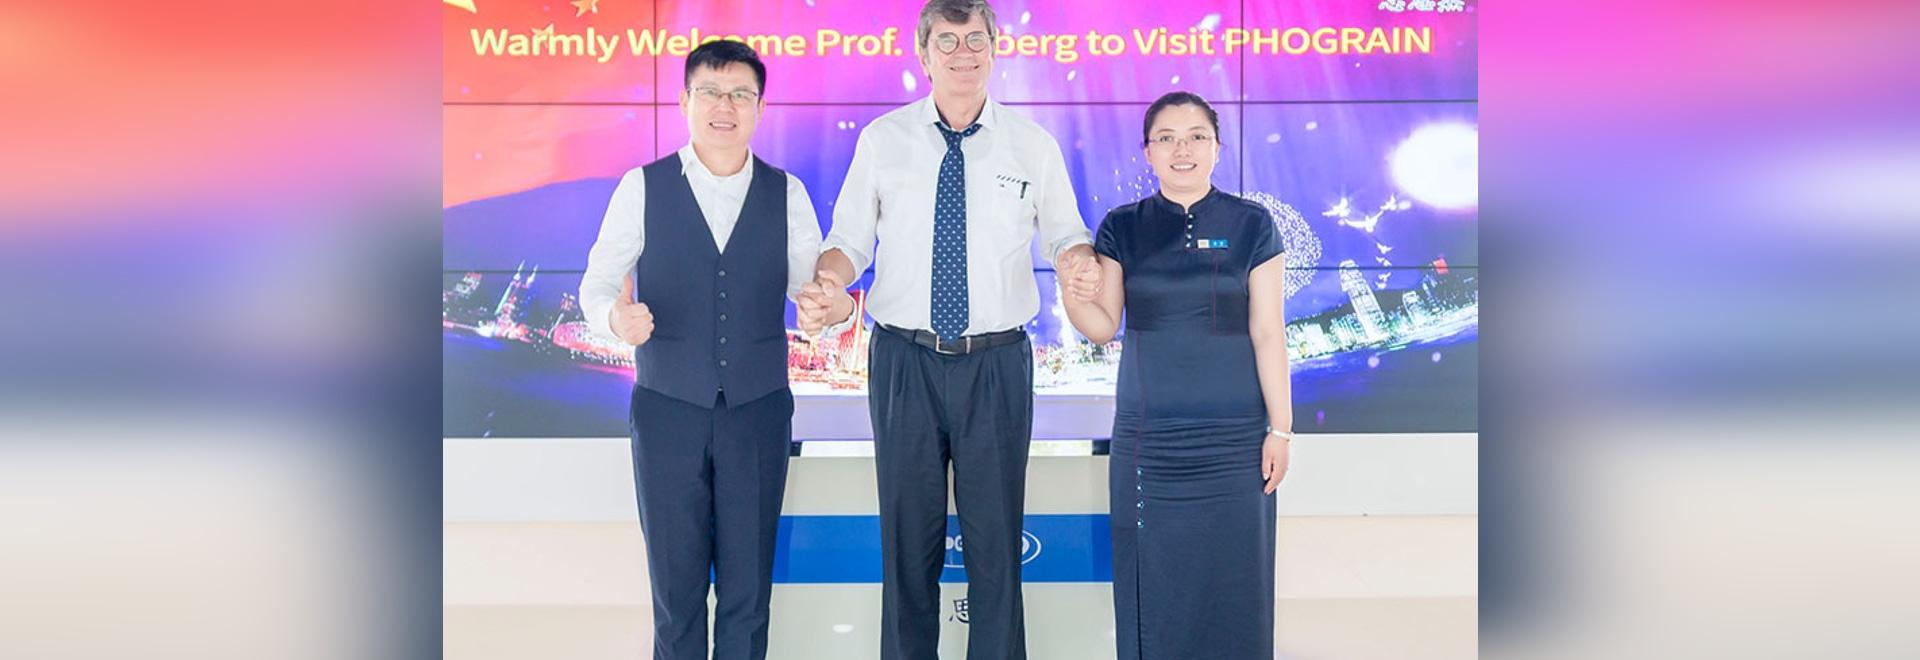 Warmly Welcome Prof. Dieter Bimberg Visiting PHOGRAIN